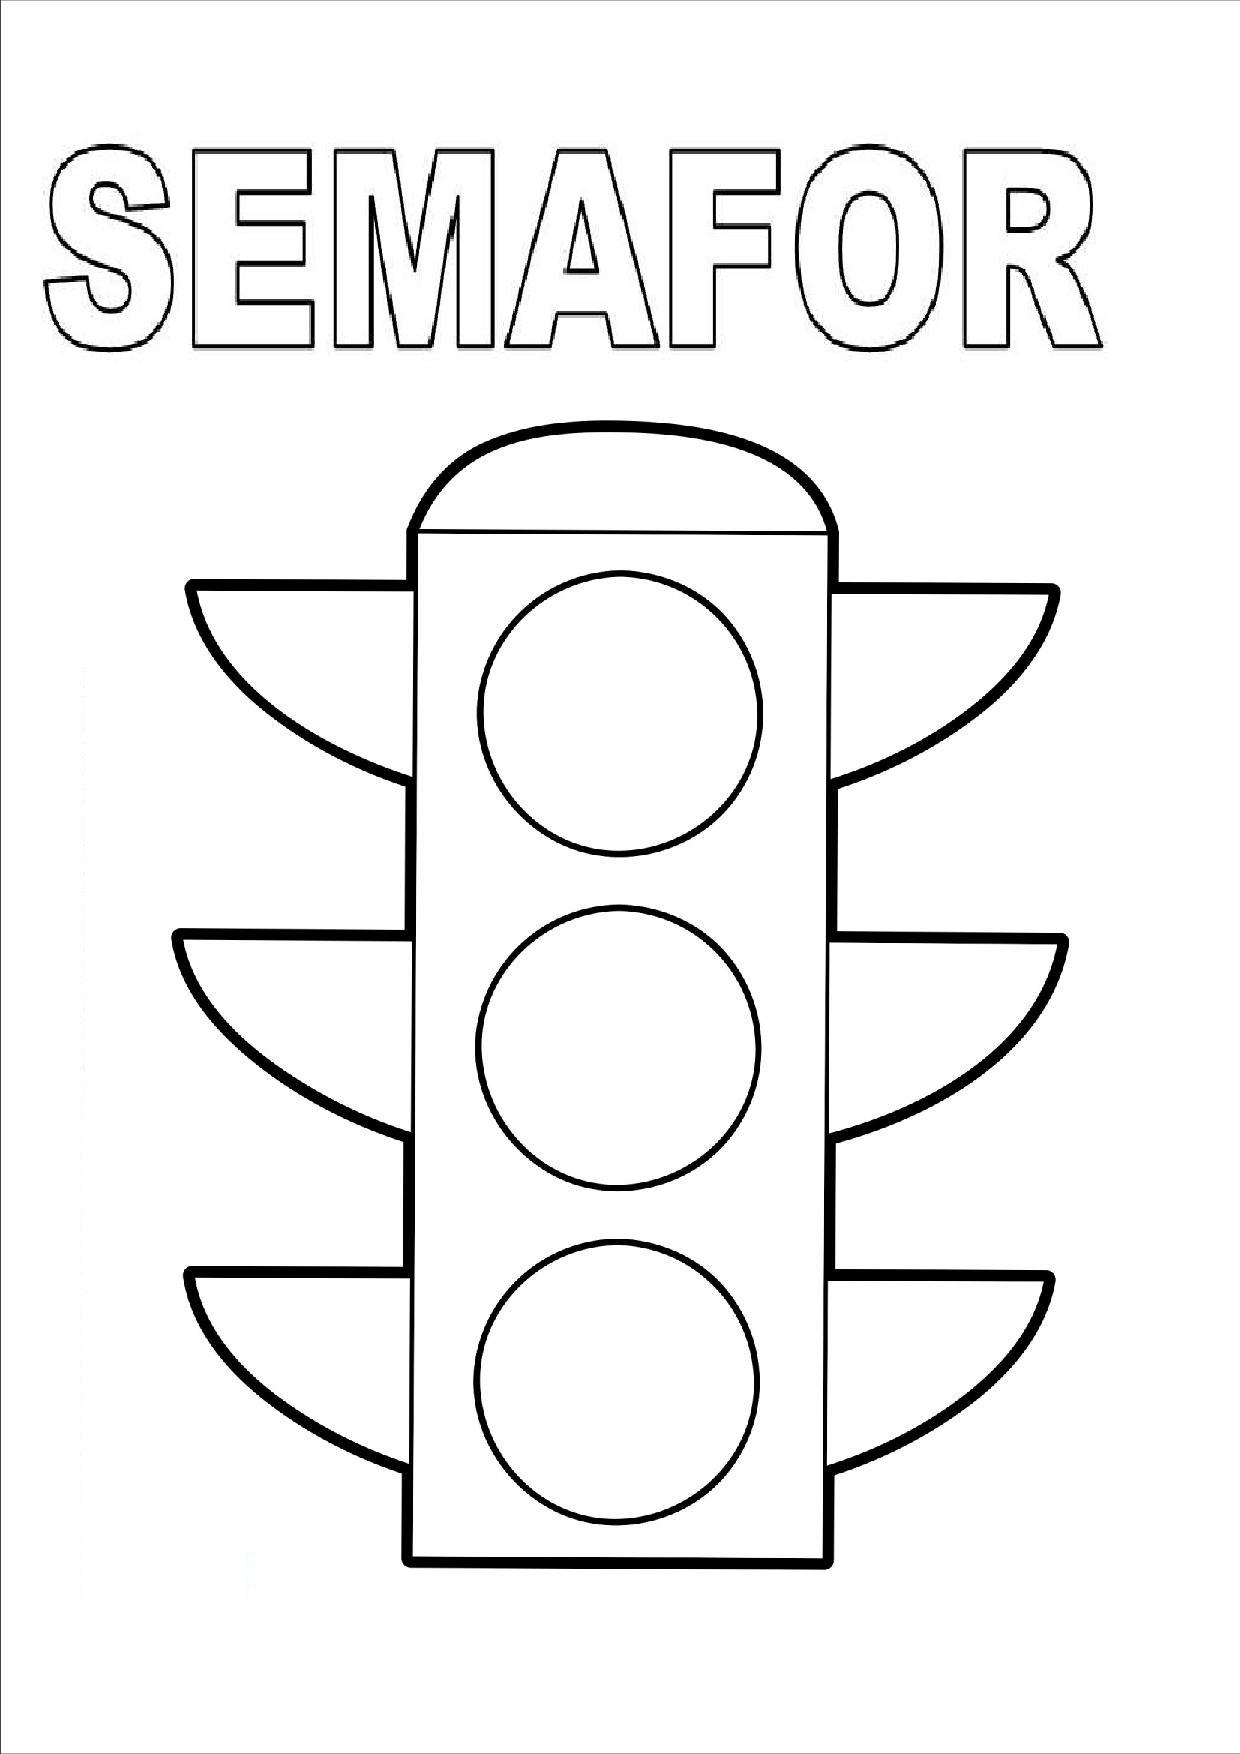 Semafor Traffic Light Coloring Pages Transportation Preschool